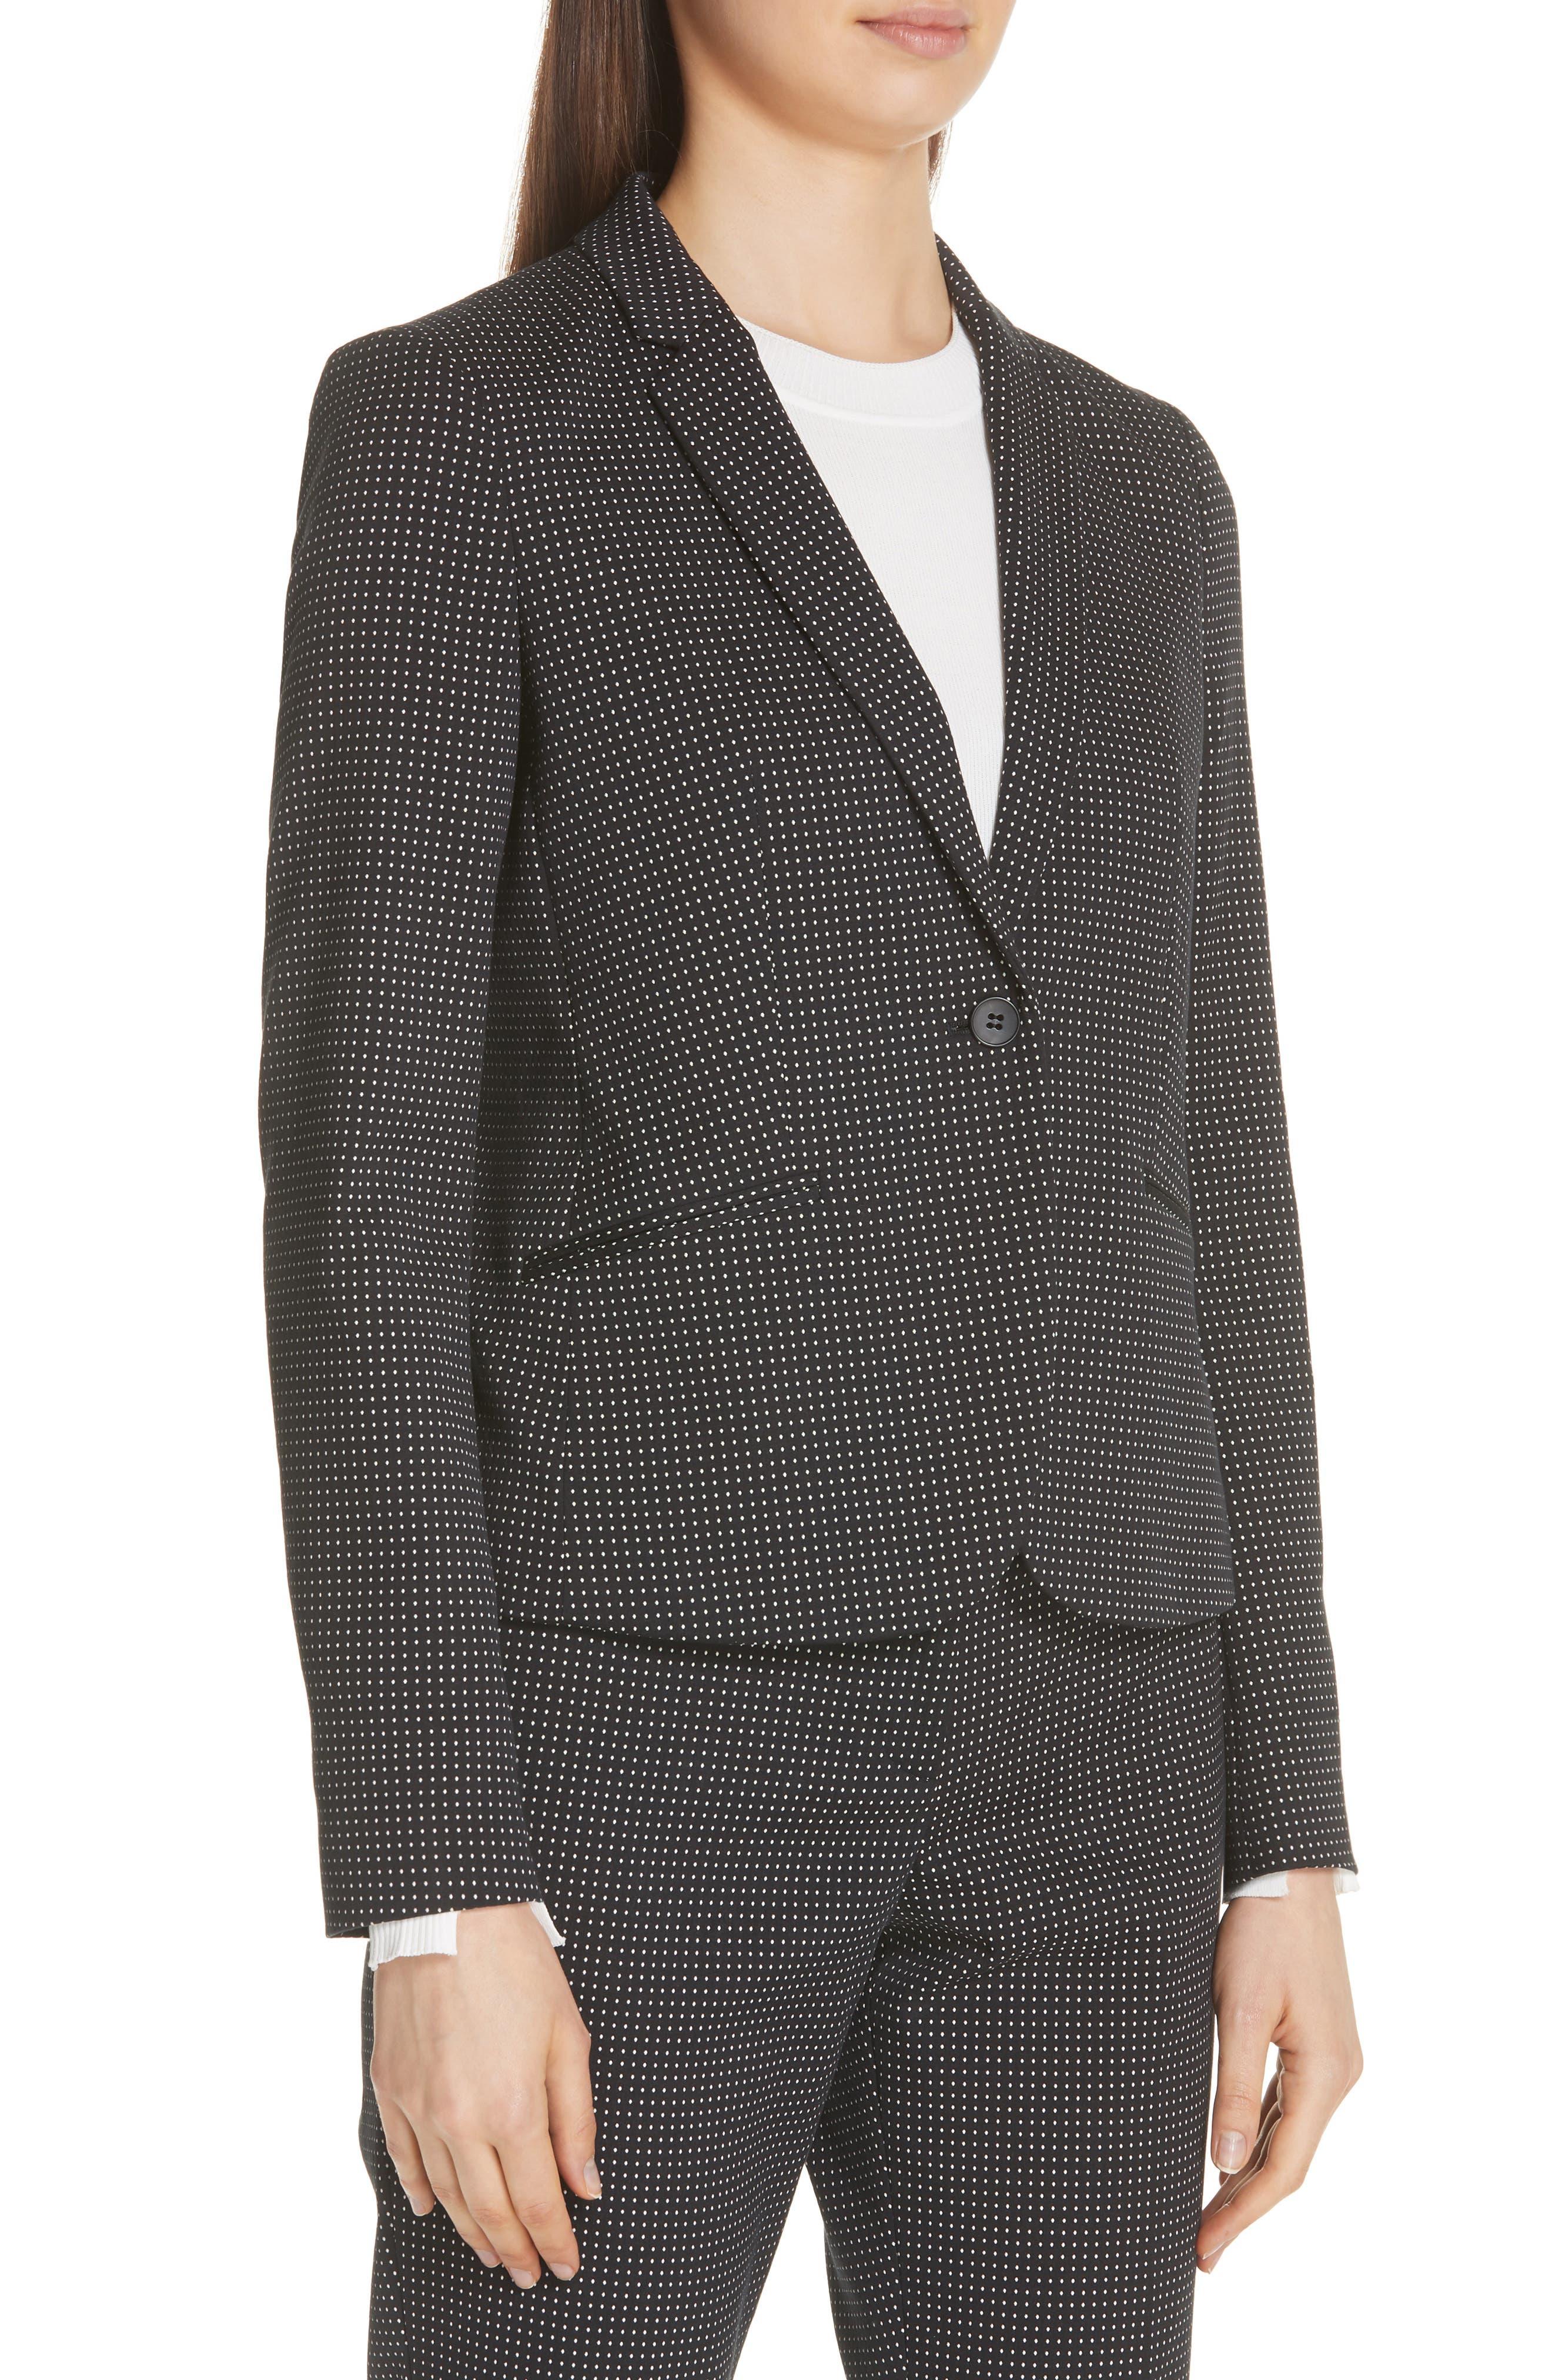 Jumano Dot Stretch Jacket,                             Alternate thumbnail 4, color,                             BLACK FANTASY